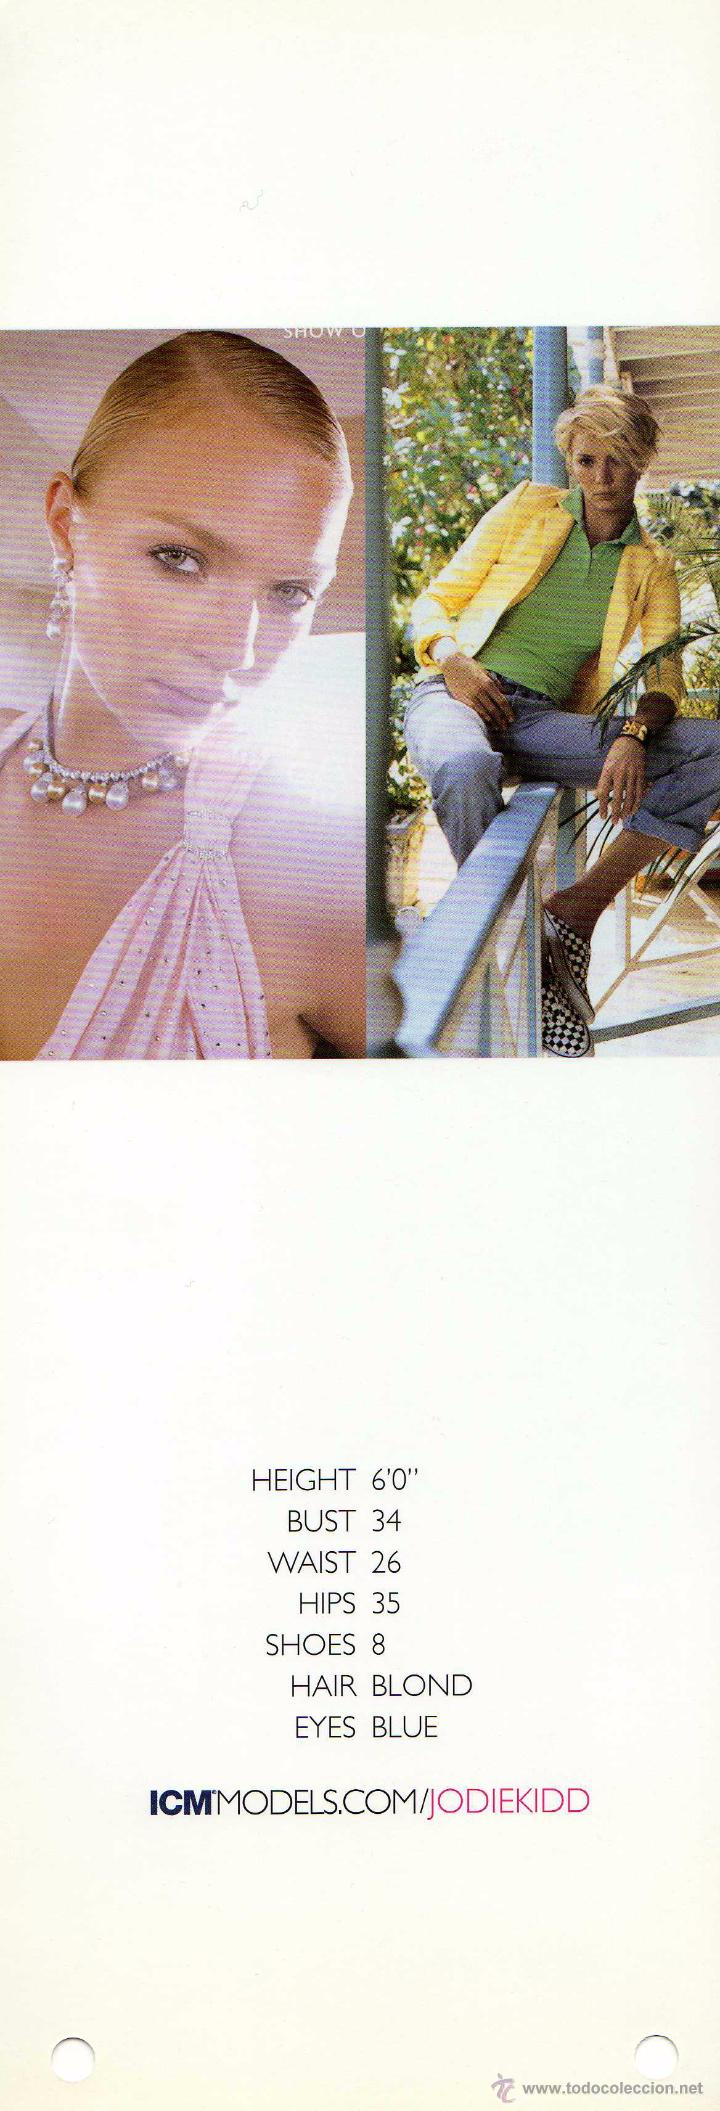 Fotografía antigua: TOP MODEL: 2004 Show Package COMPOSIT TARJETA POSTAL de JODIE KIDD 29,5 X 10,5 cm. - Foto 2 - 48365809